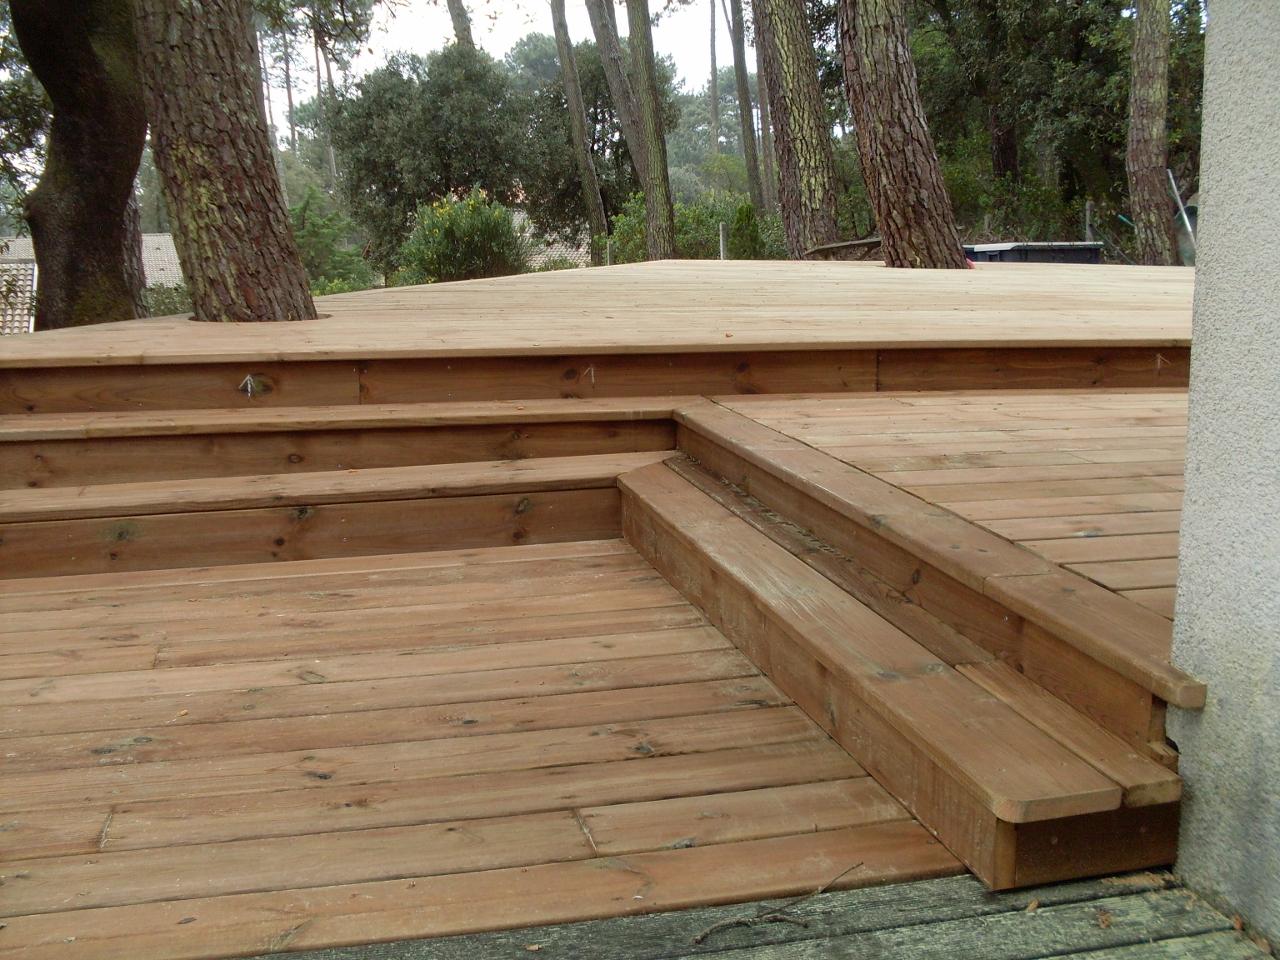 Terrasse bois 3 niveaux lacanau 33680 artisan charpente menuiserie for Avancee terrasse couverte